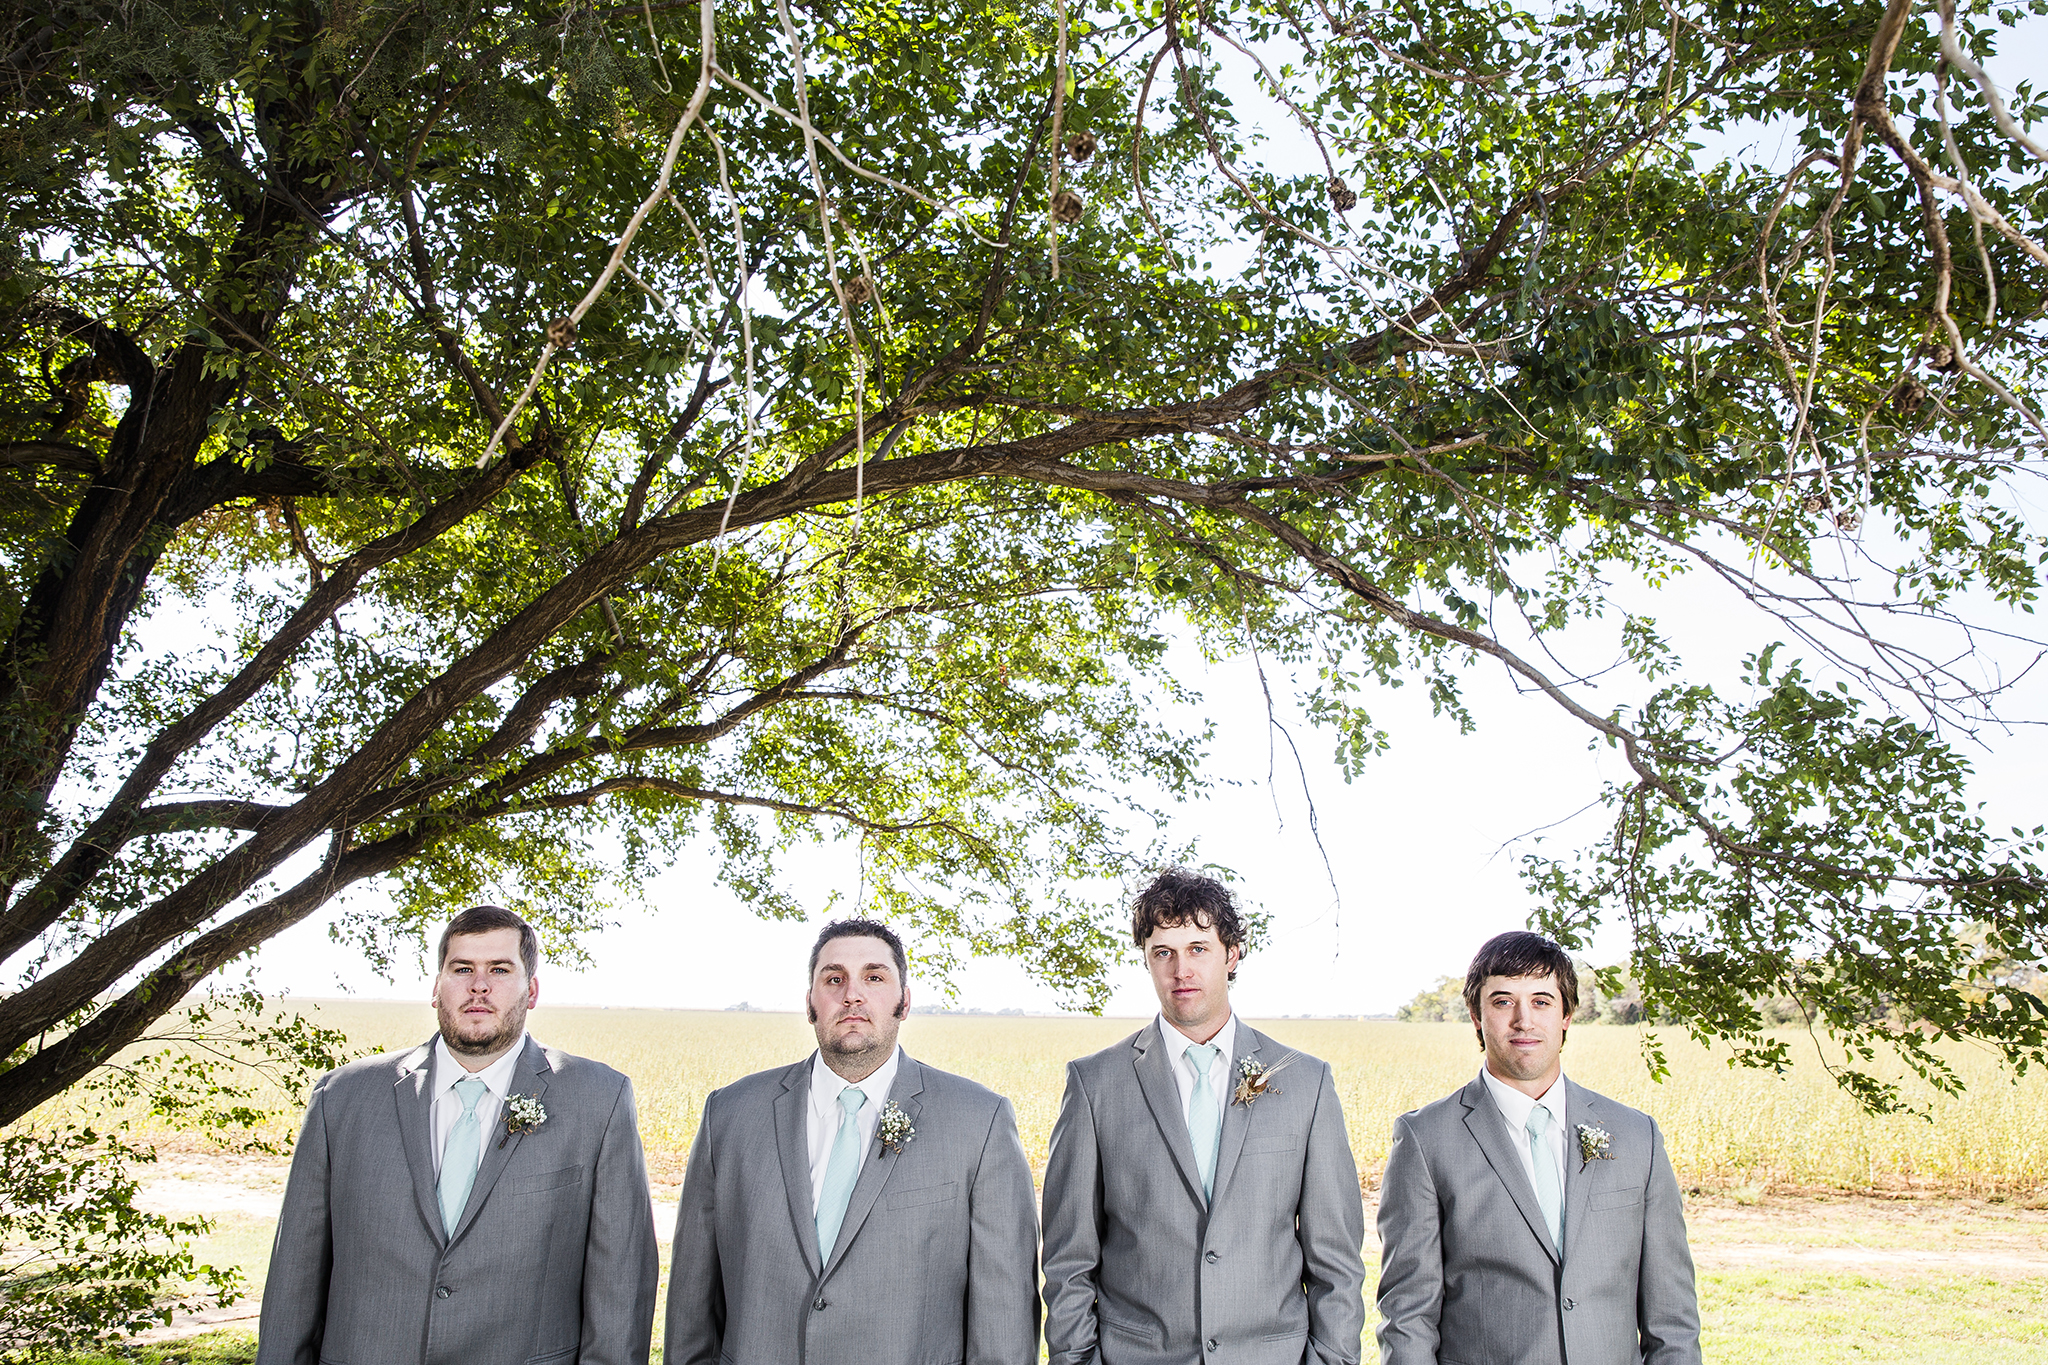 Lubbock Wedding Photography Wedding Photographer Walnut Tree Bride and Groom Portraits